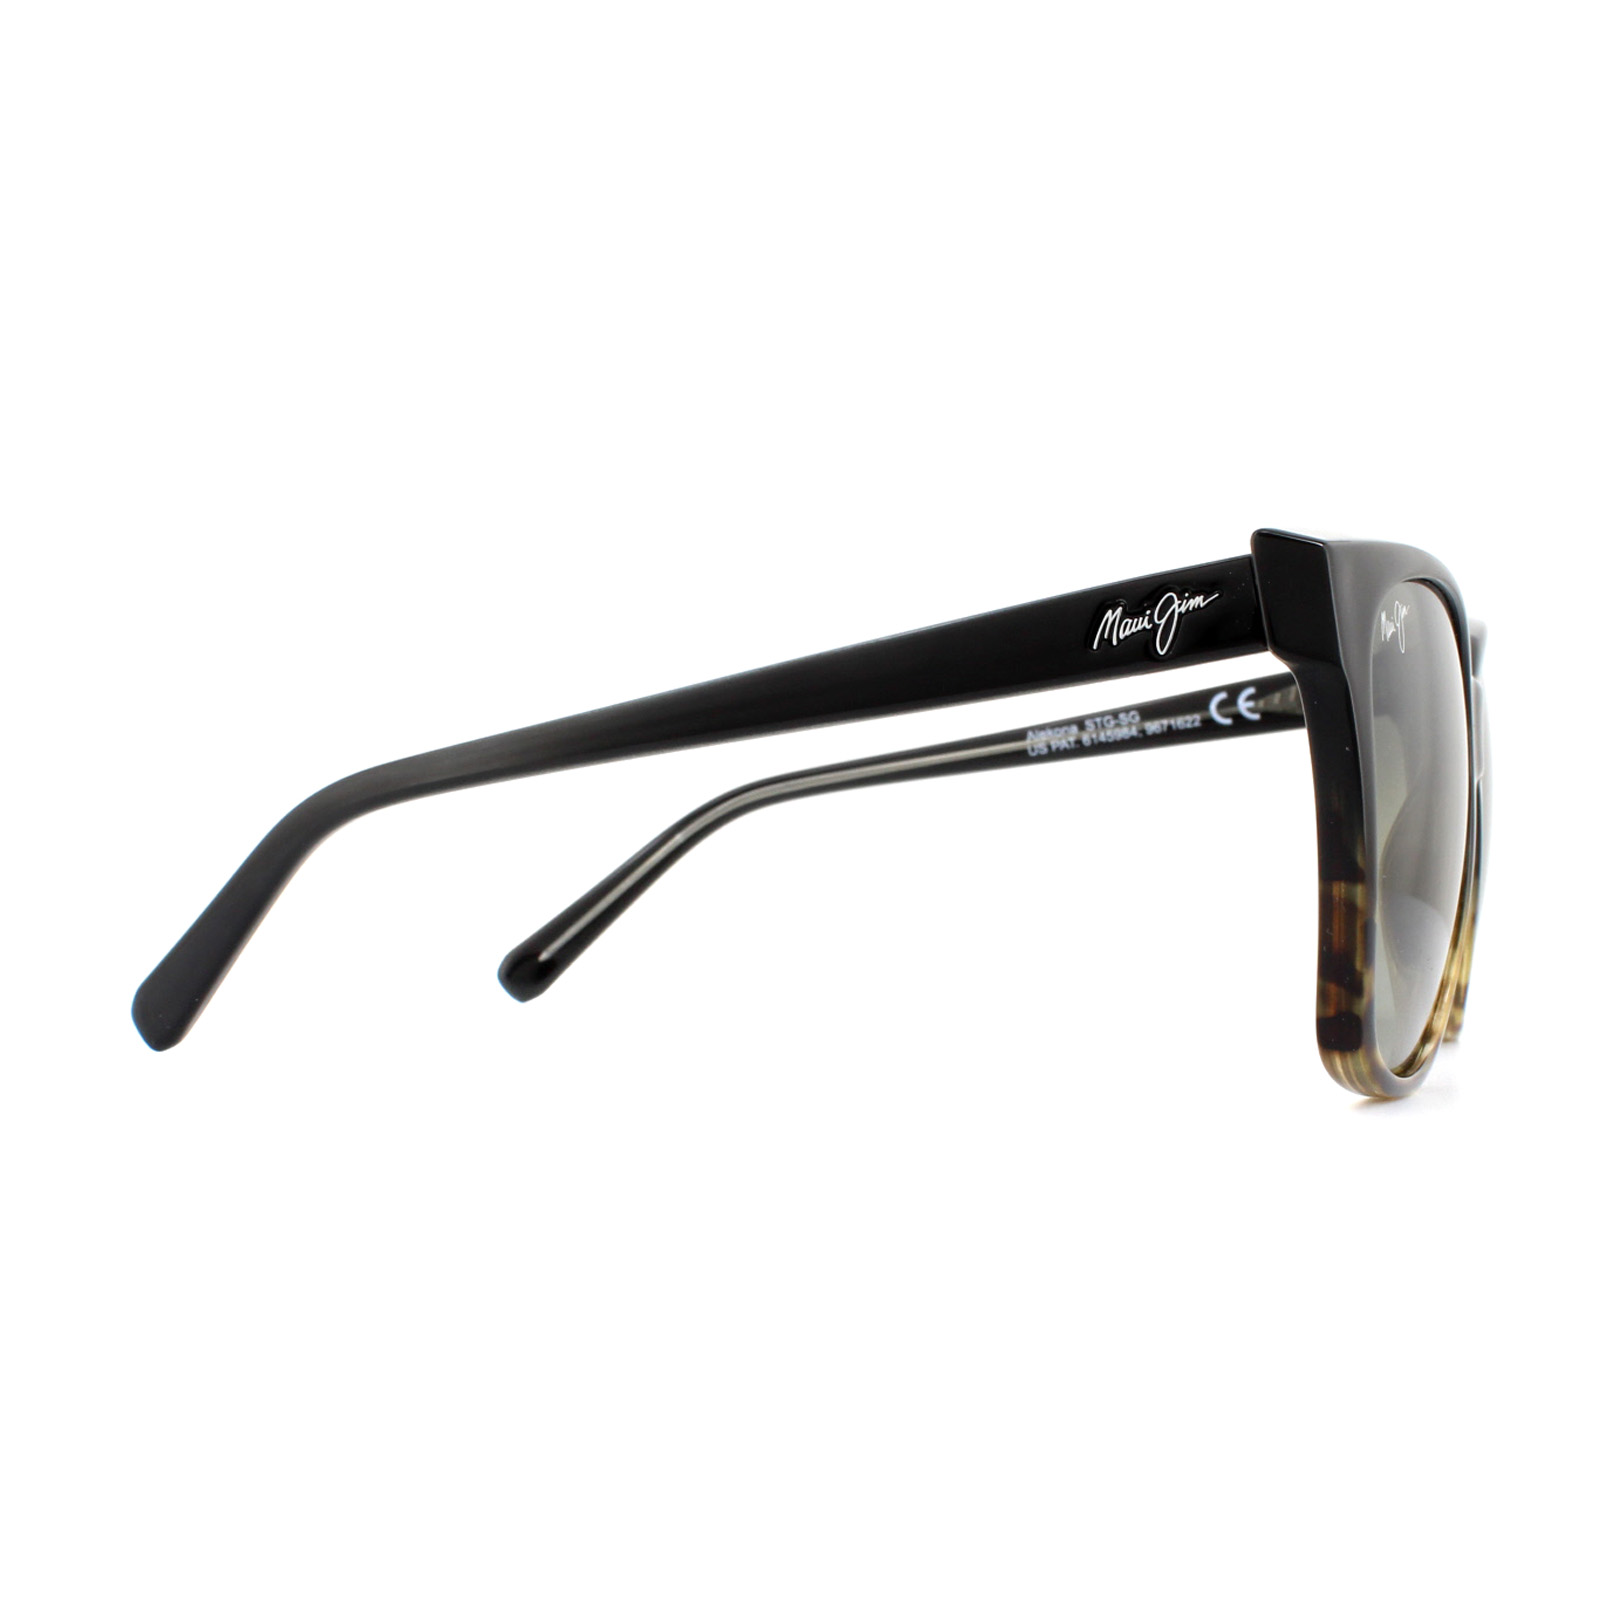 05c07eac49 Cheap Maui Jim Alekona Sunglasses - Discounted Sunglasses